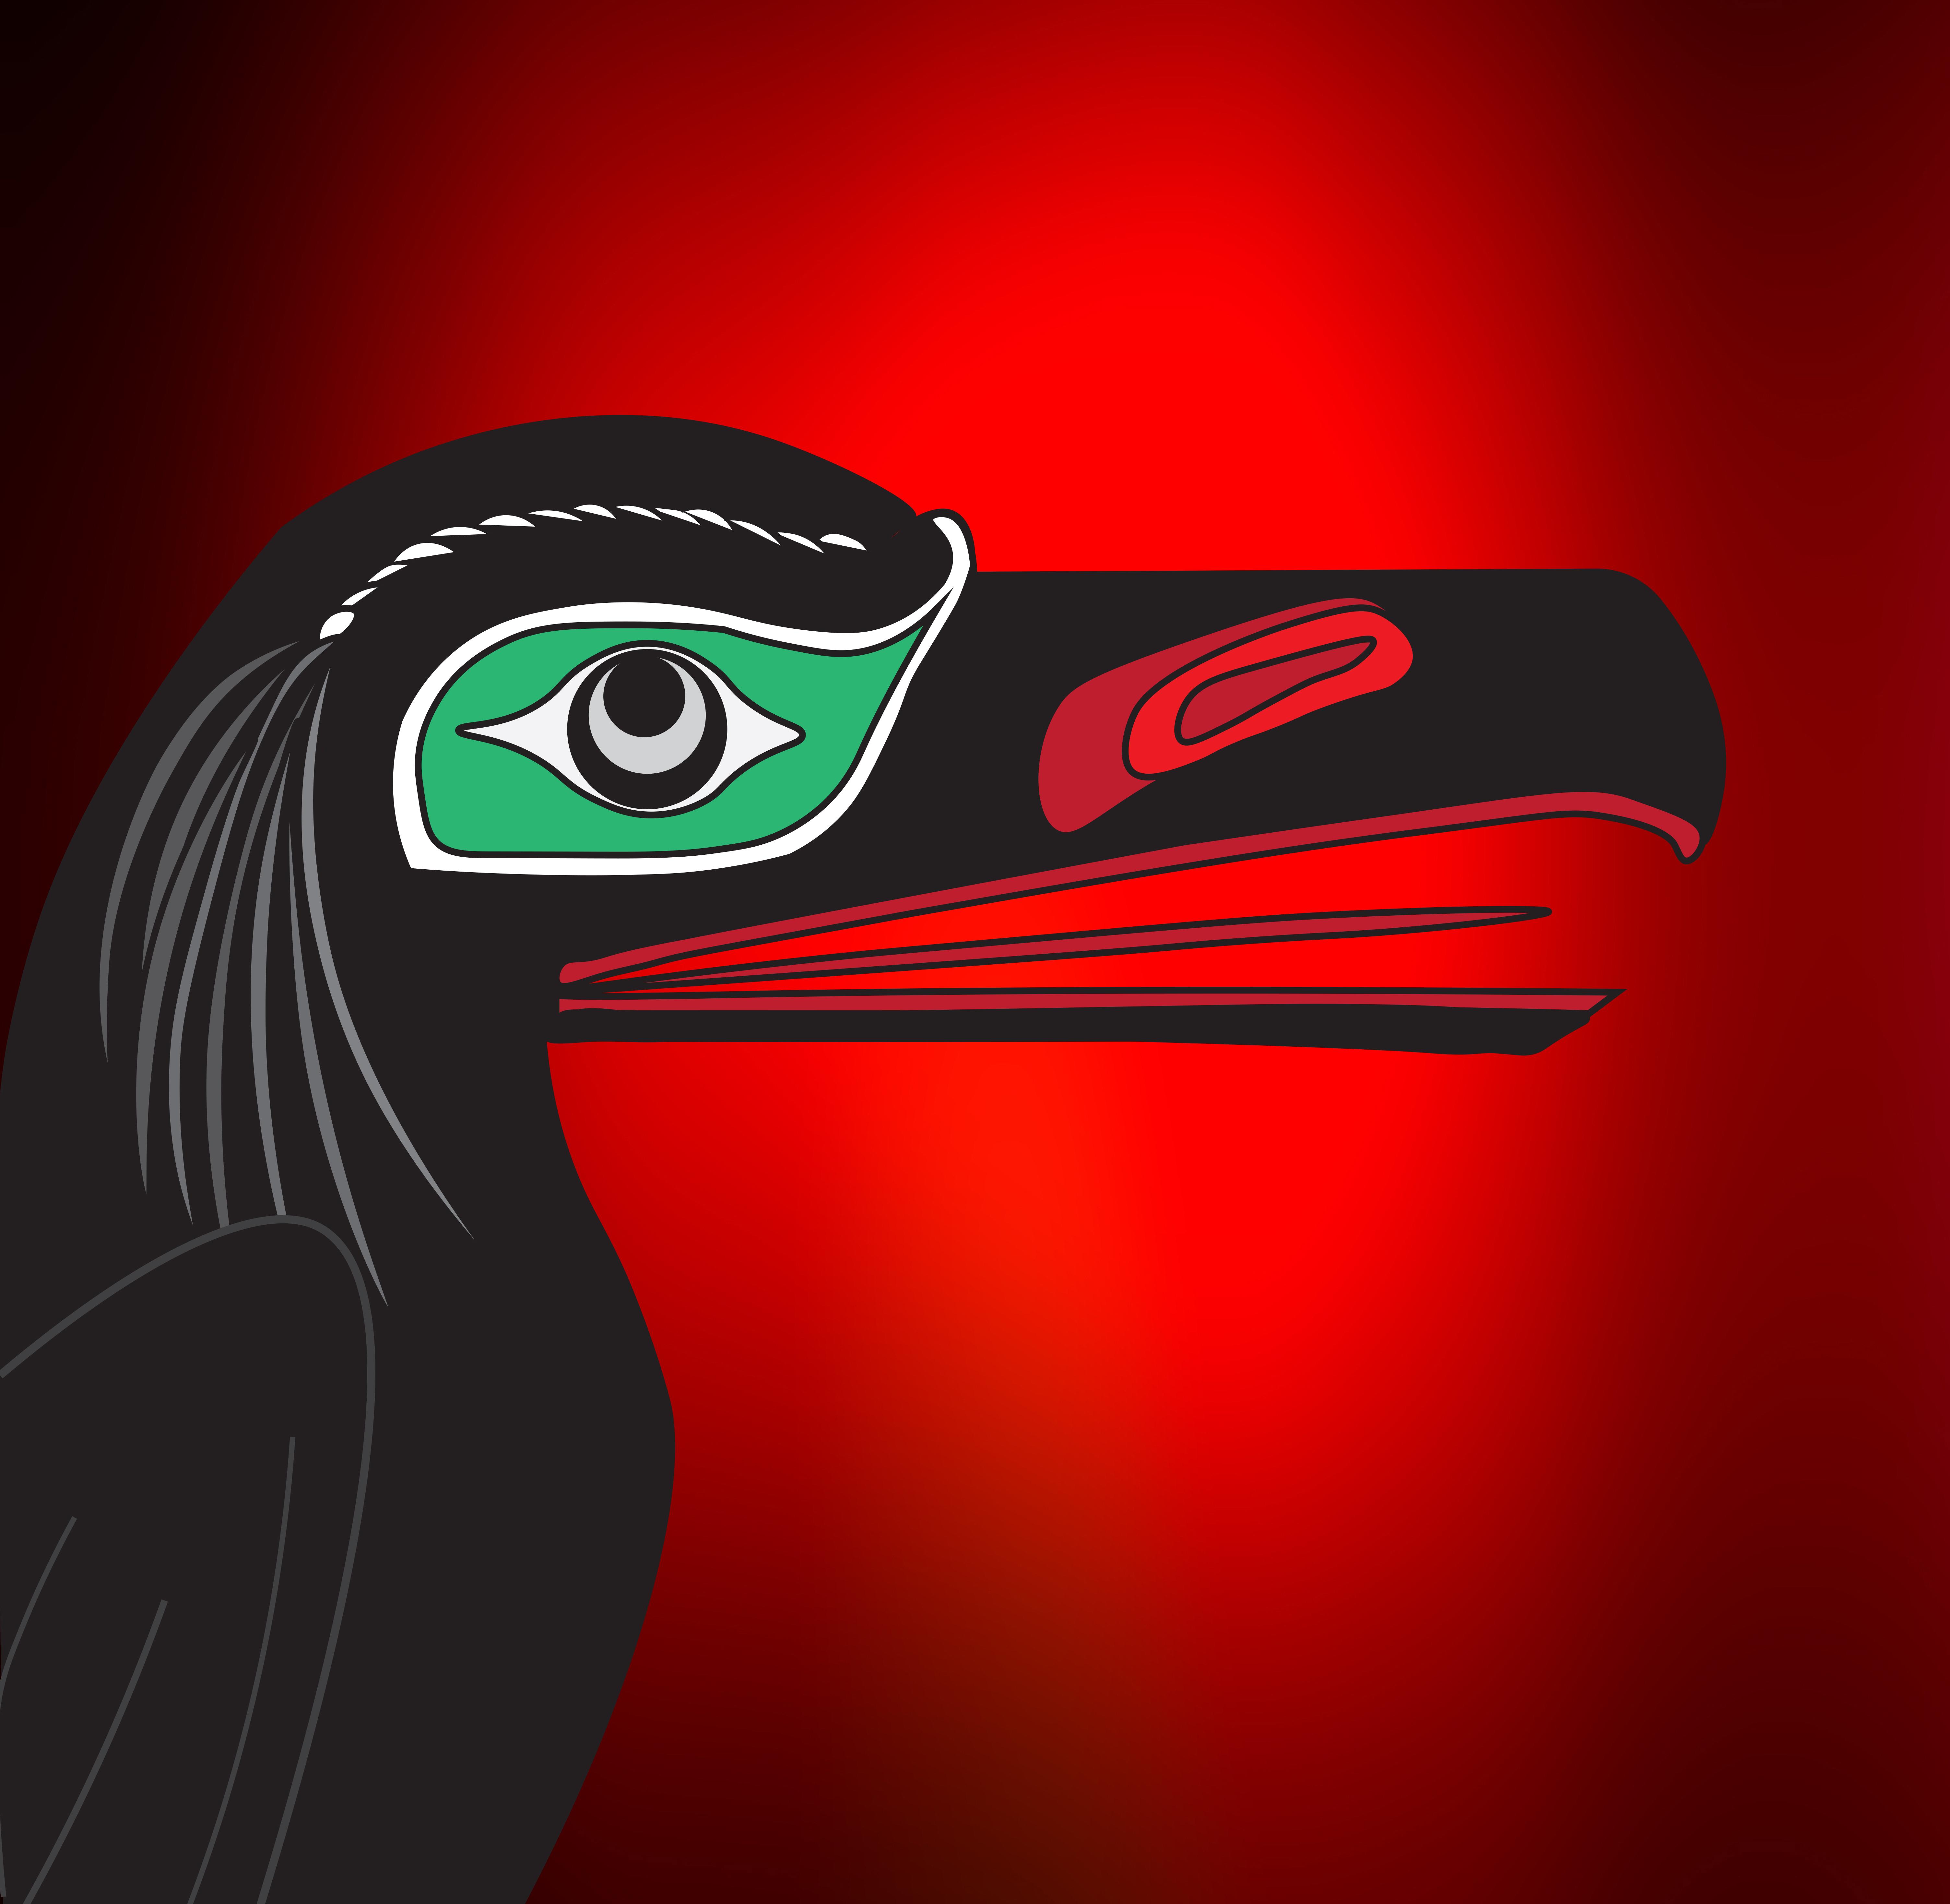 Raven's Mask